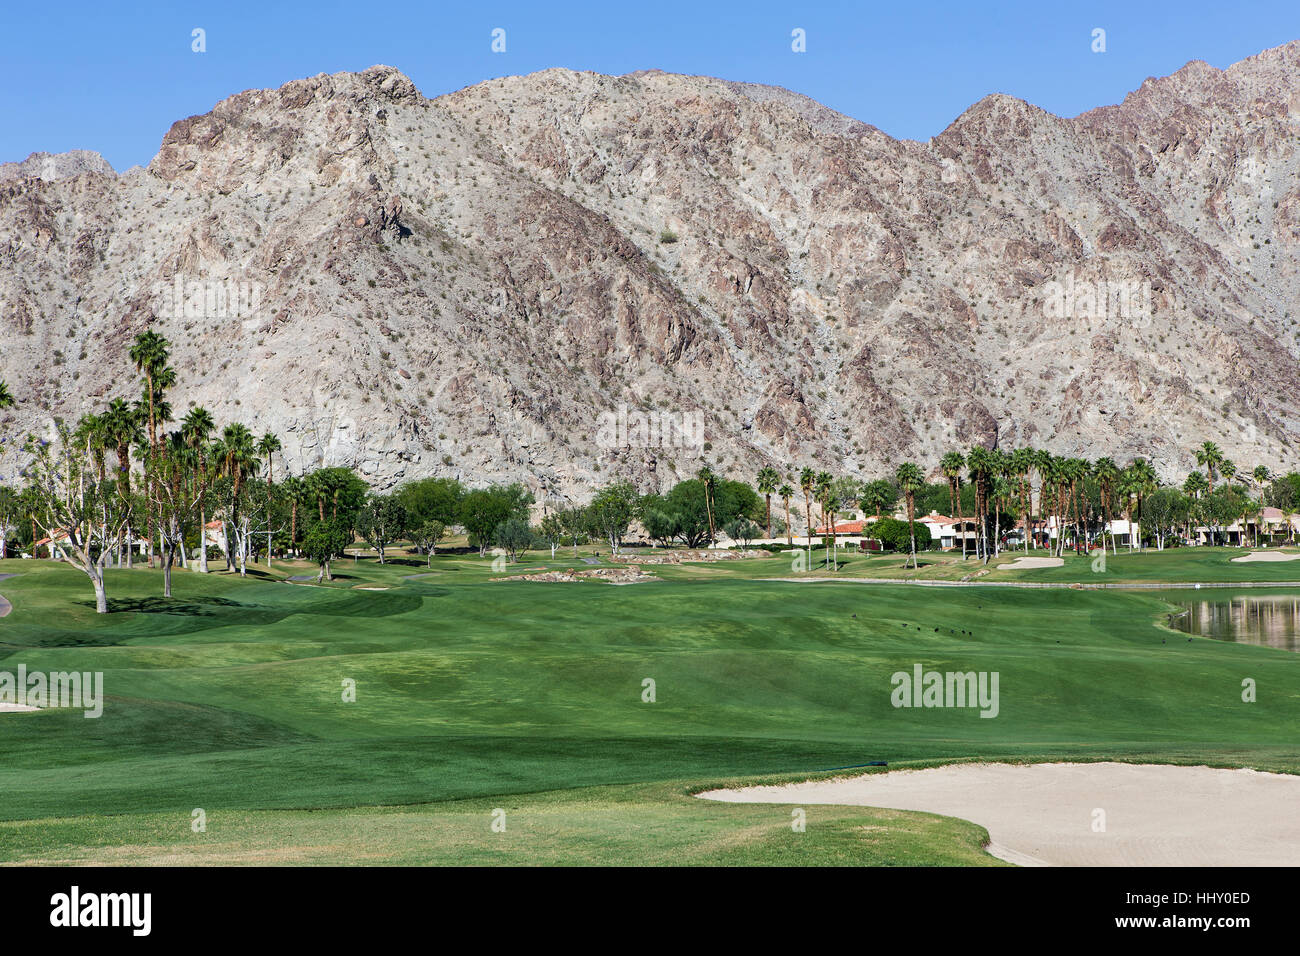 Pga West golf course in La Quinta, Palm Springs, California, usa - Stock Image